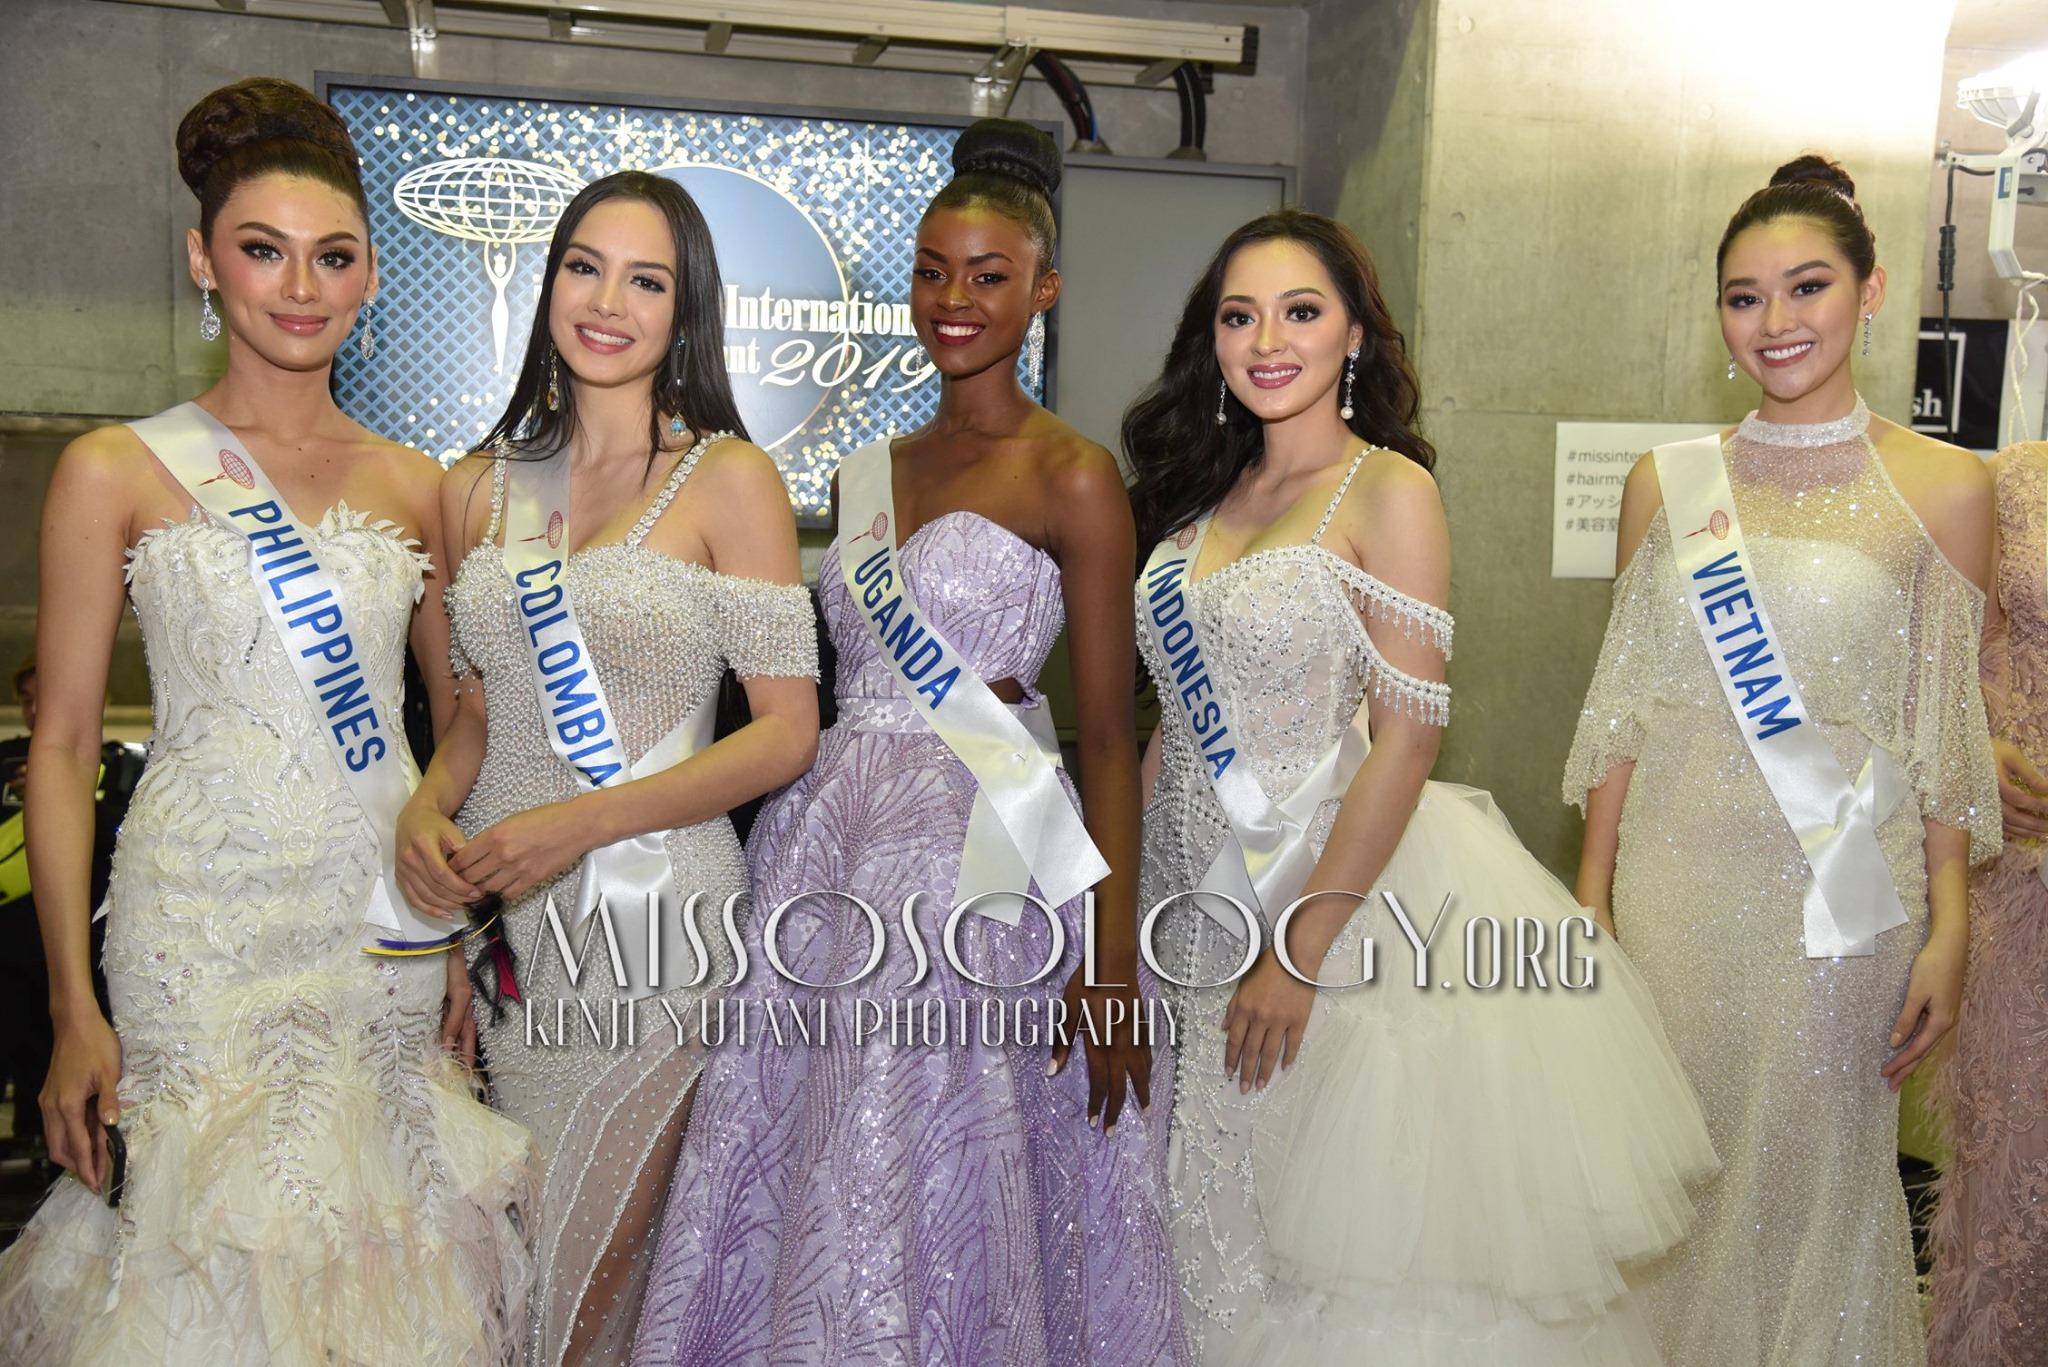 maria alejandra vengoechea, miss colombia hispanoamericana 2021/3rd runner-up de miss international 2019. - Página 13 74460910